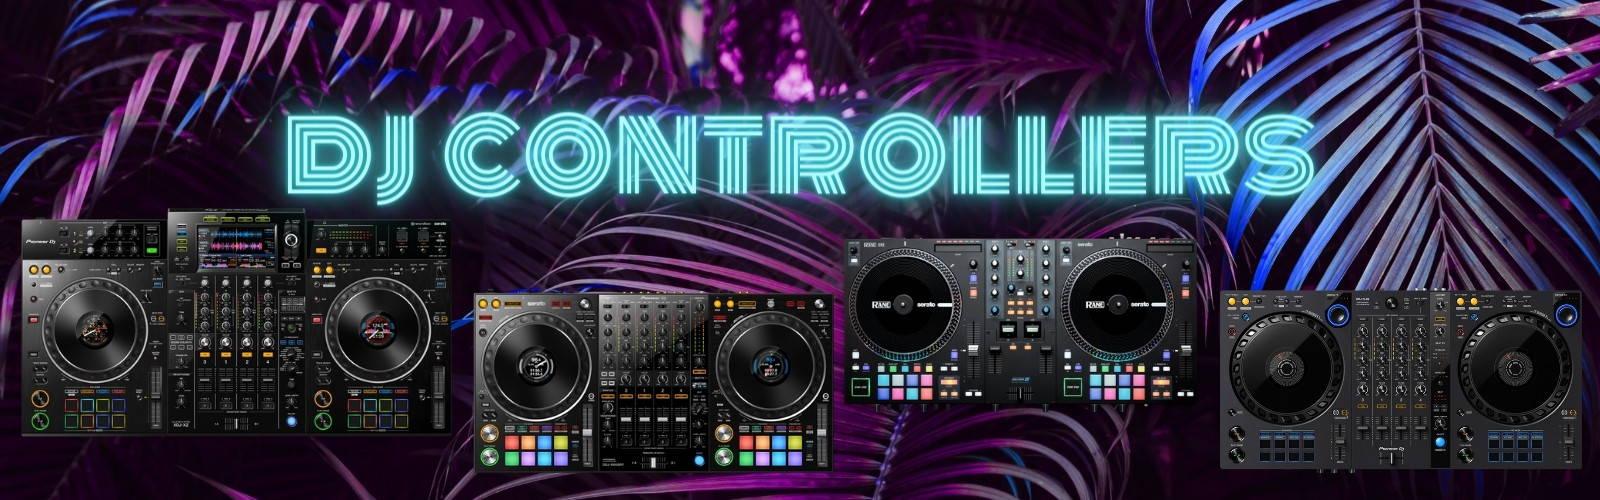 Top Dj Controllers Pioneer DJ Rane